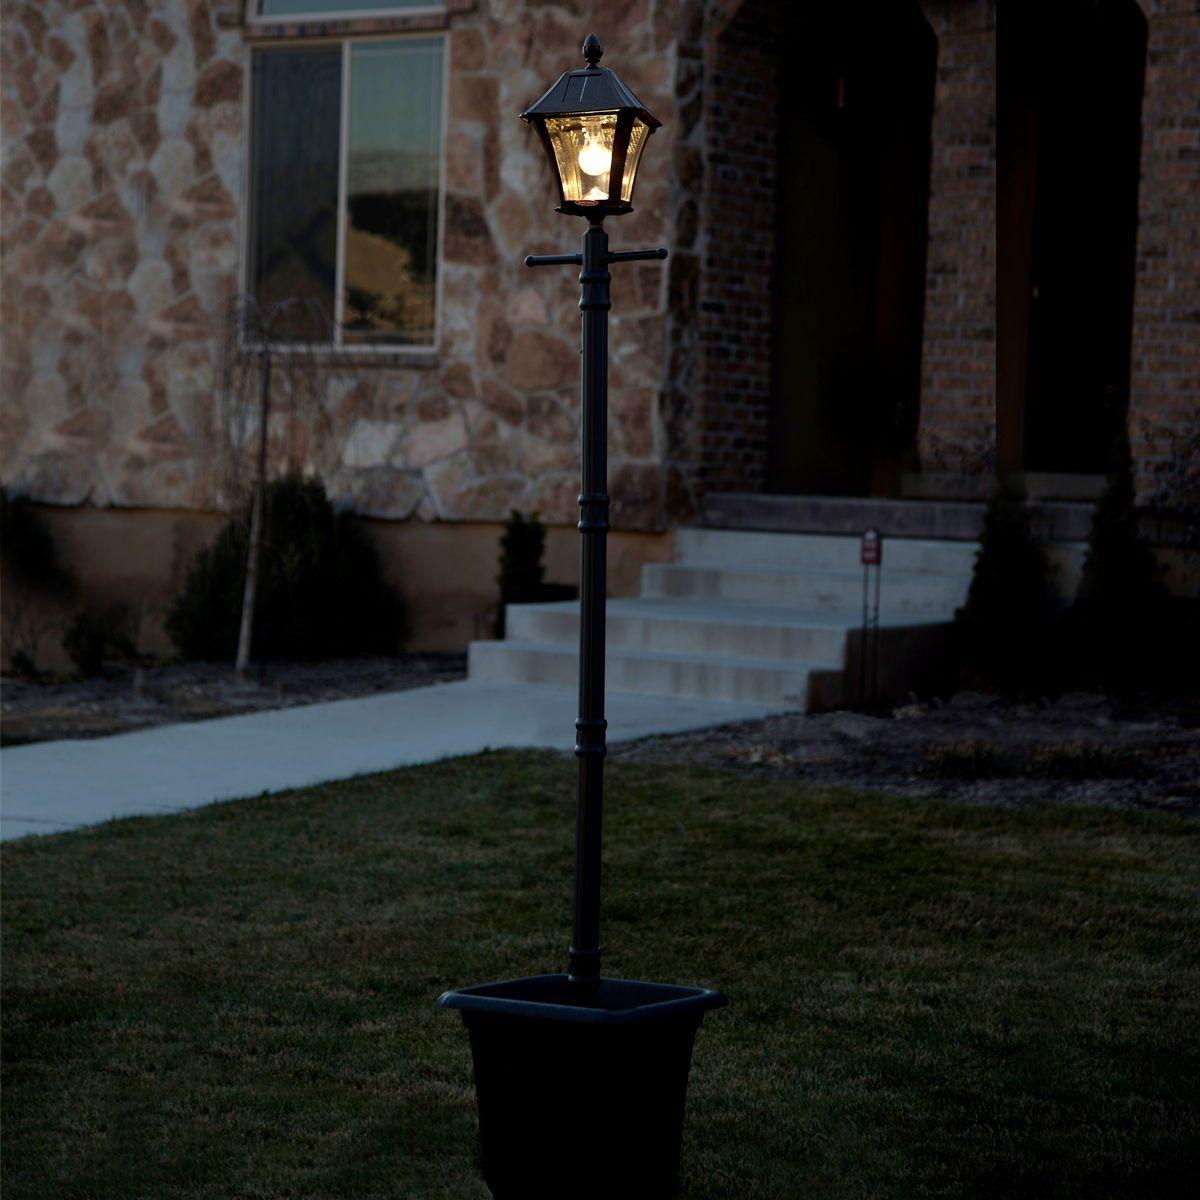 Baytown Bulb Solar Lamp Post With Ez Anchor And Planter Gs 106b Plsg Solar Lamp Post Lamp Post Solar Lamp